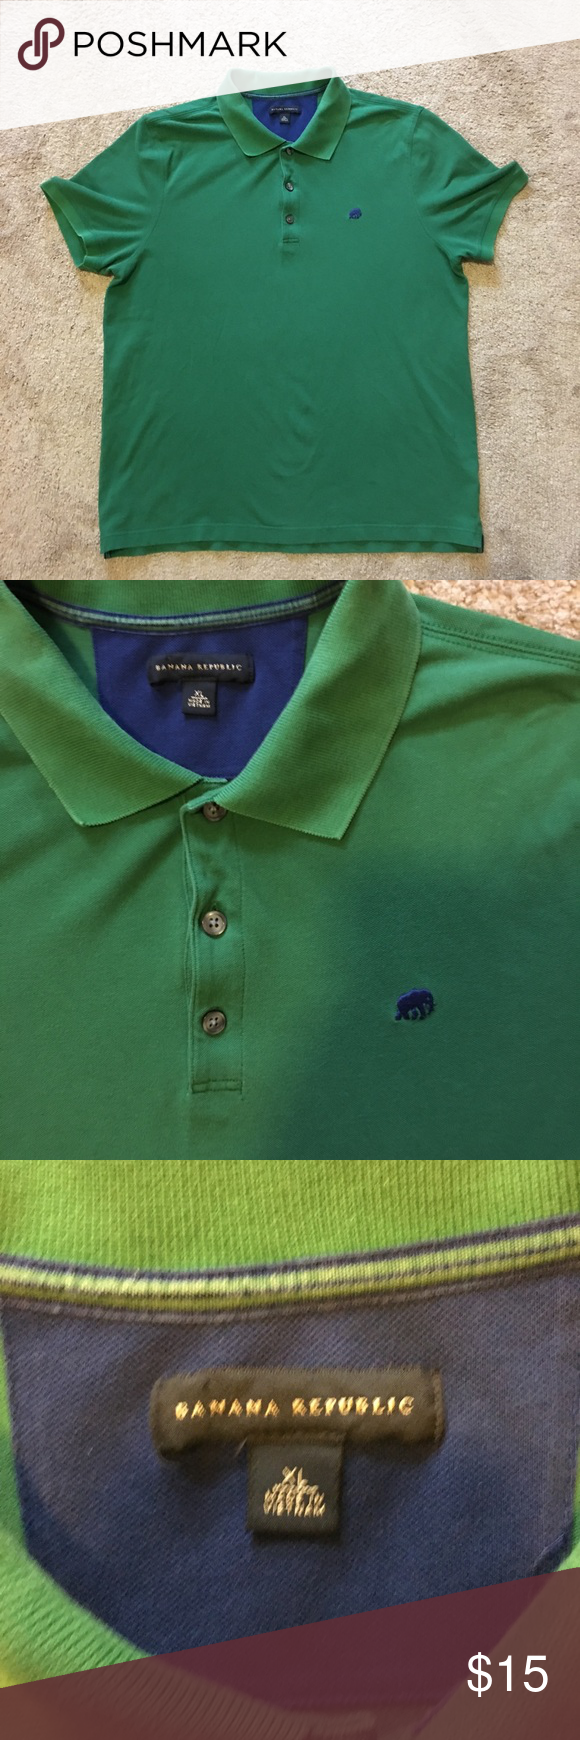 Banana Republic Polo Button Shirt Green In 2018 My Posh Picks